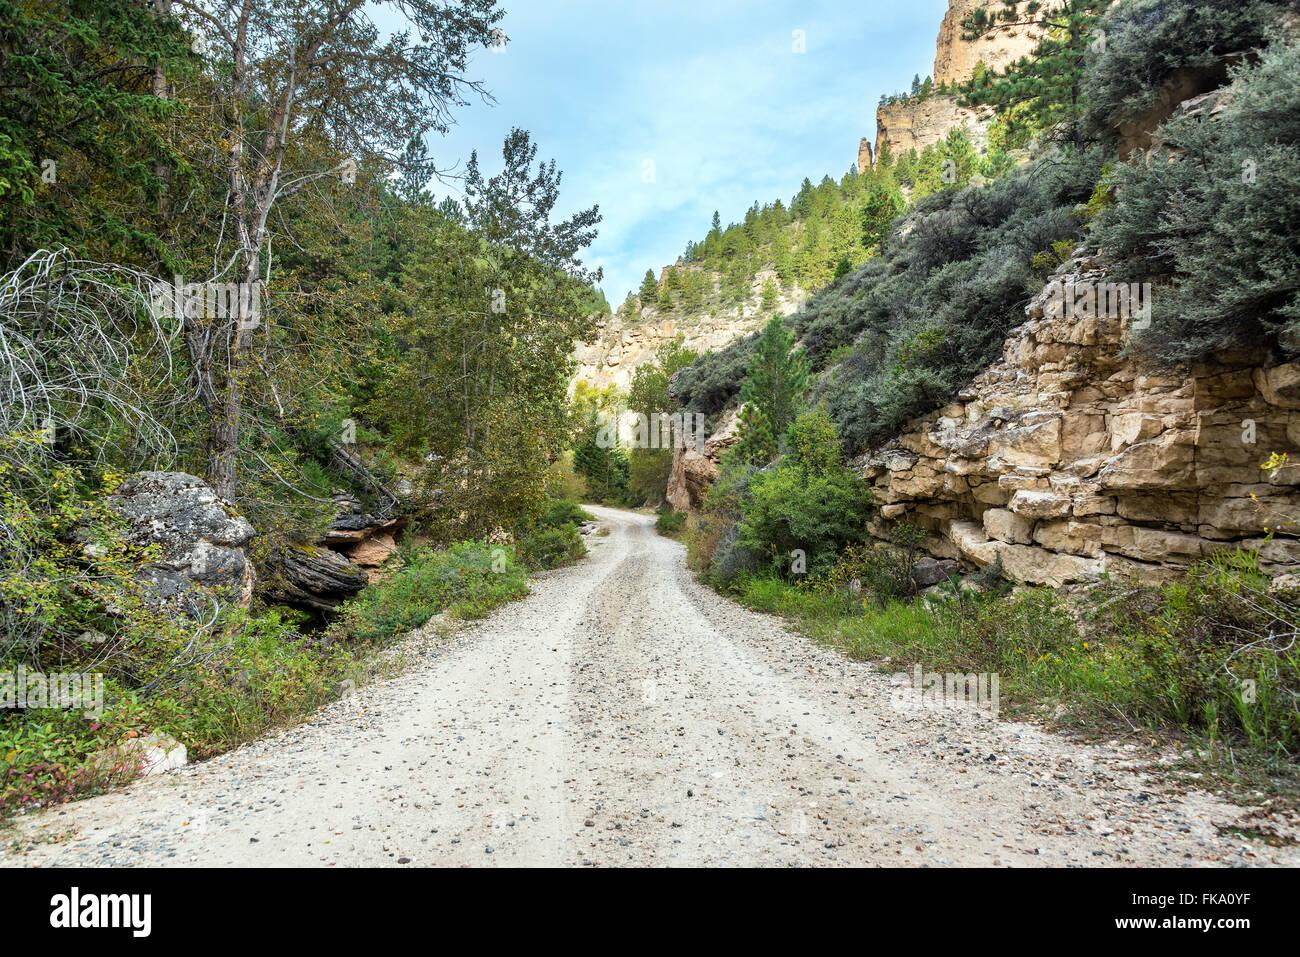 Road through Crazy Woman Canyon near Buffalo, Wyoming - Stock Image